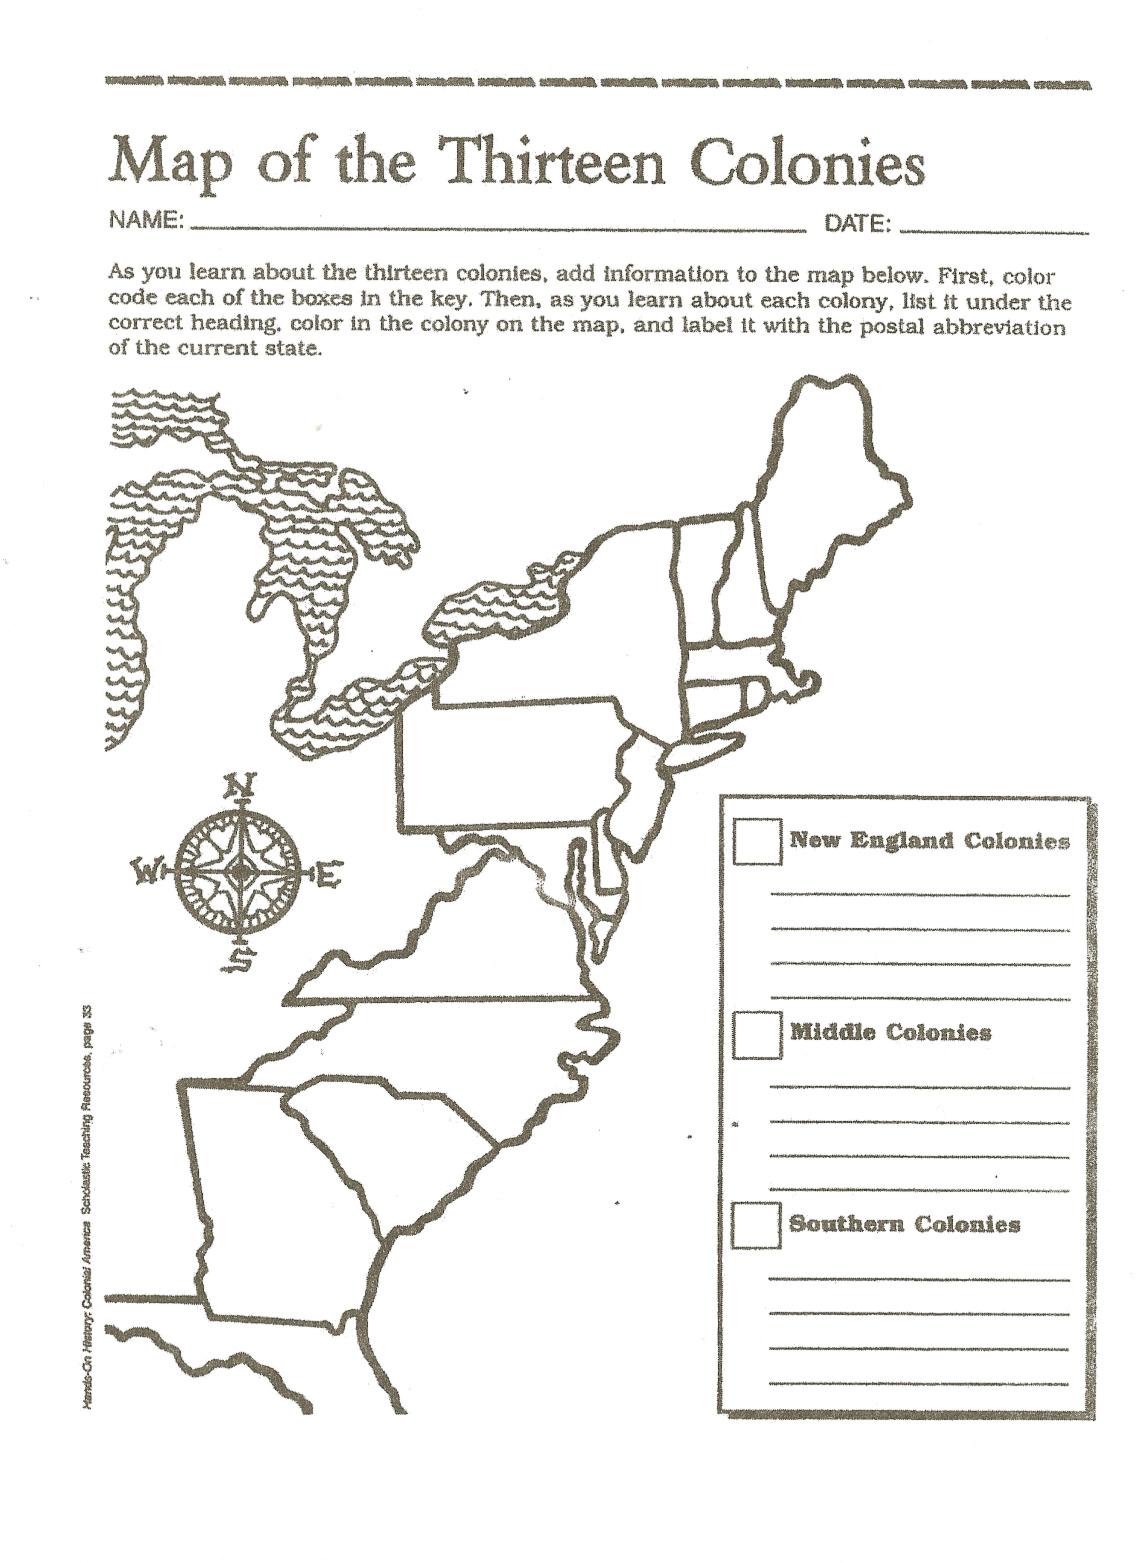 Dissertation Proposal Template